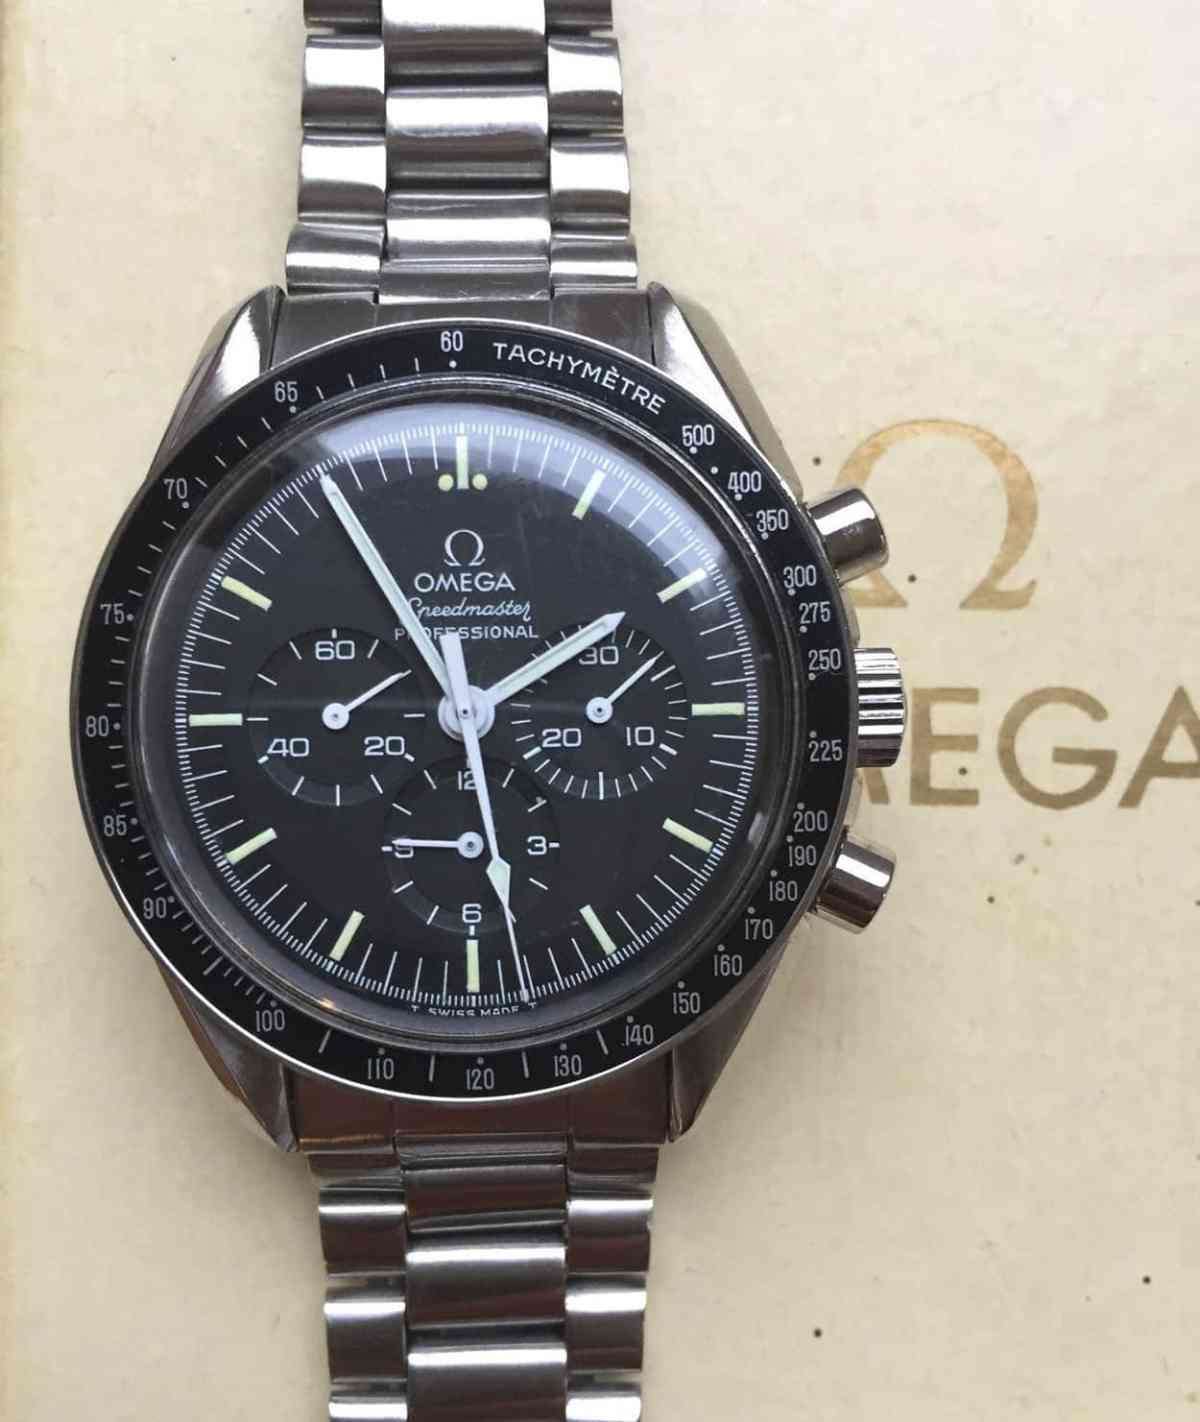 Omega Speedmaster Profesisonal - Nick's 1979 replacement watch